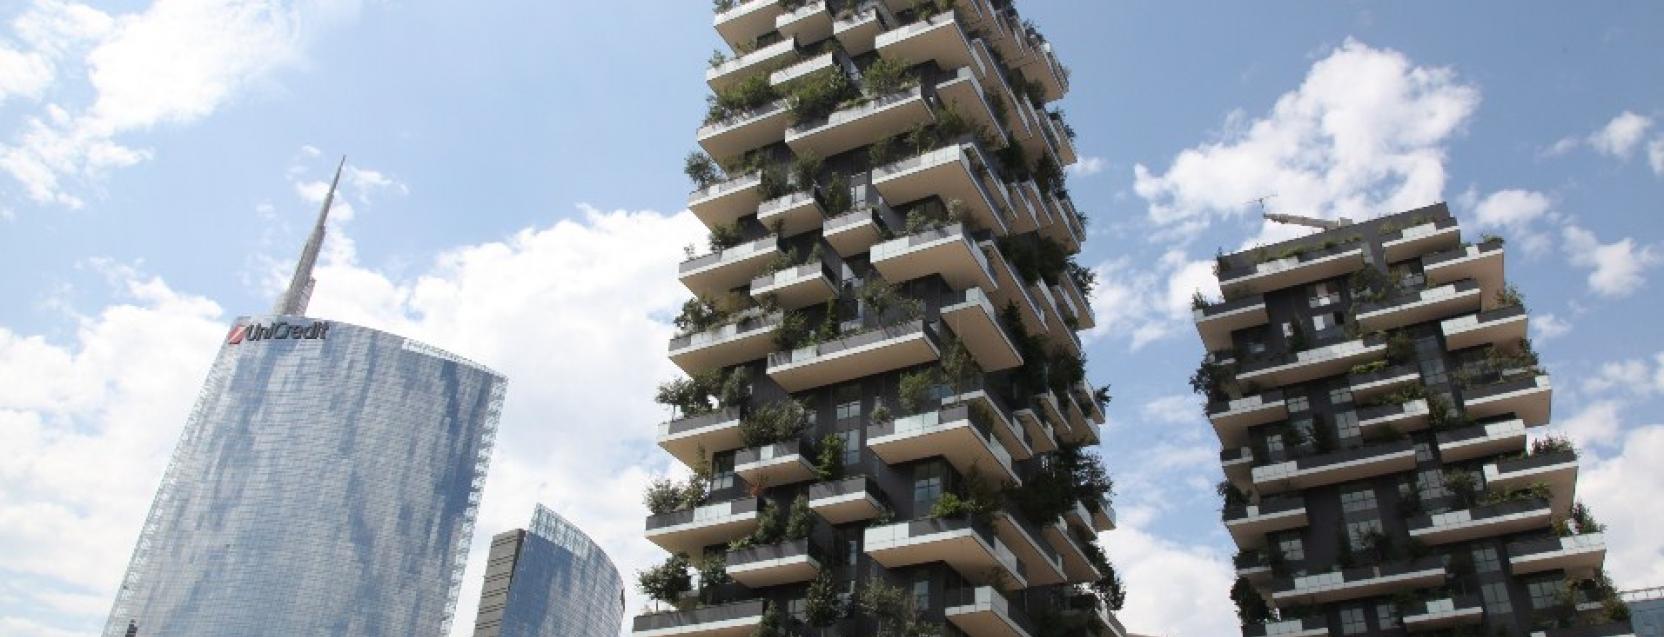 Gita skyline a Milano 2